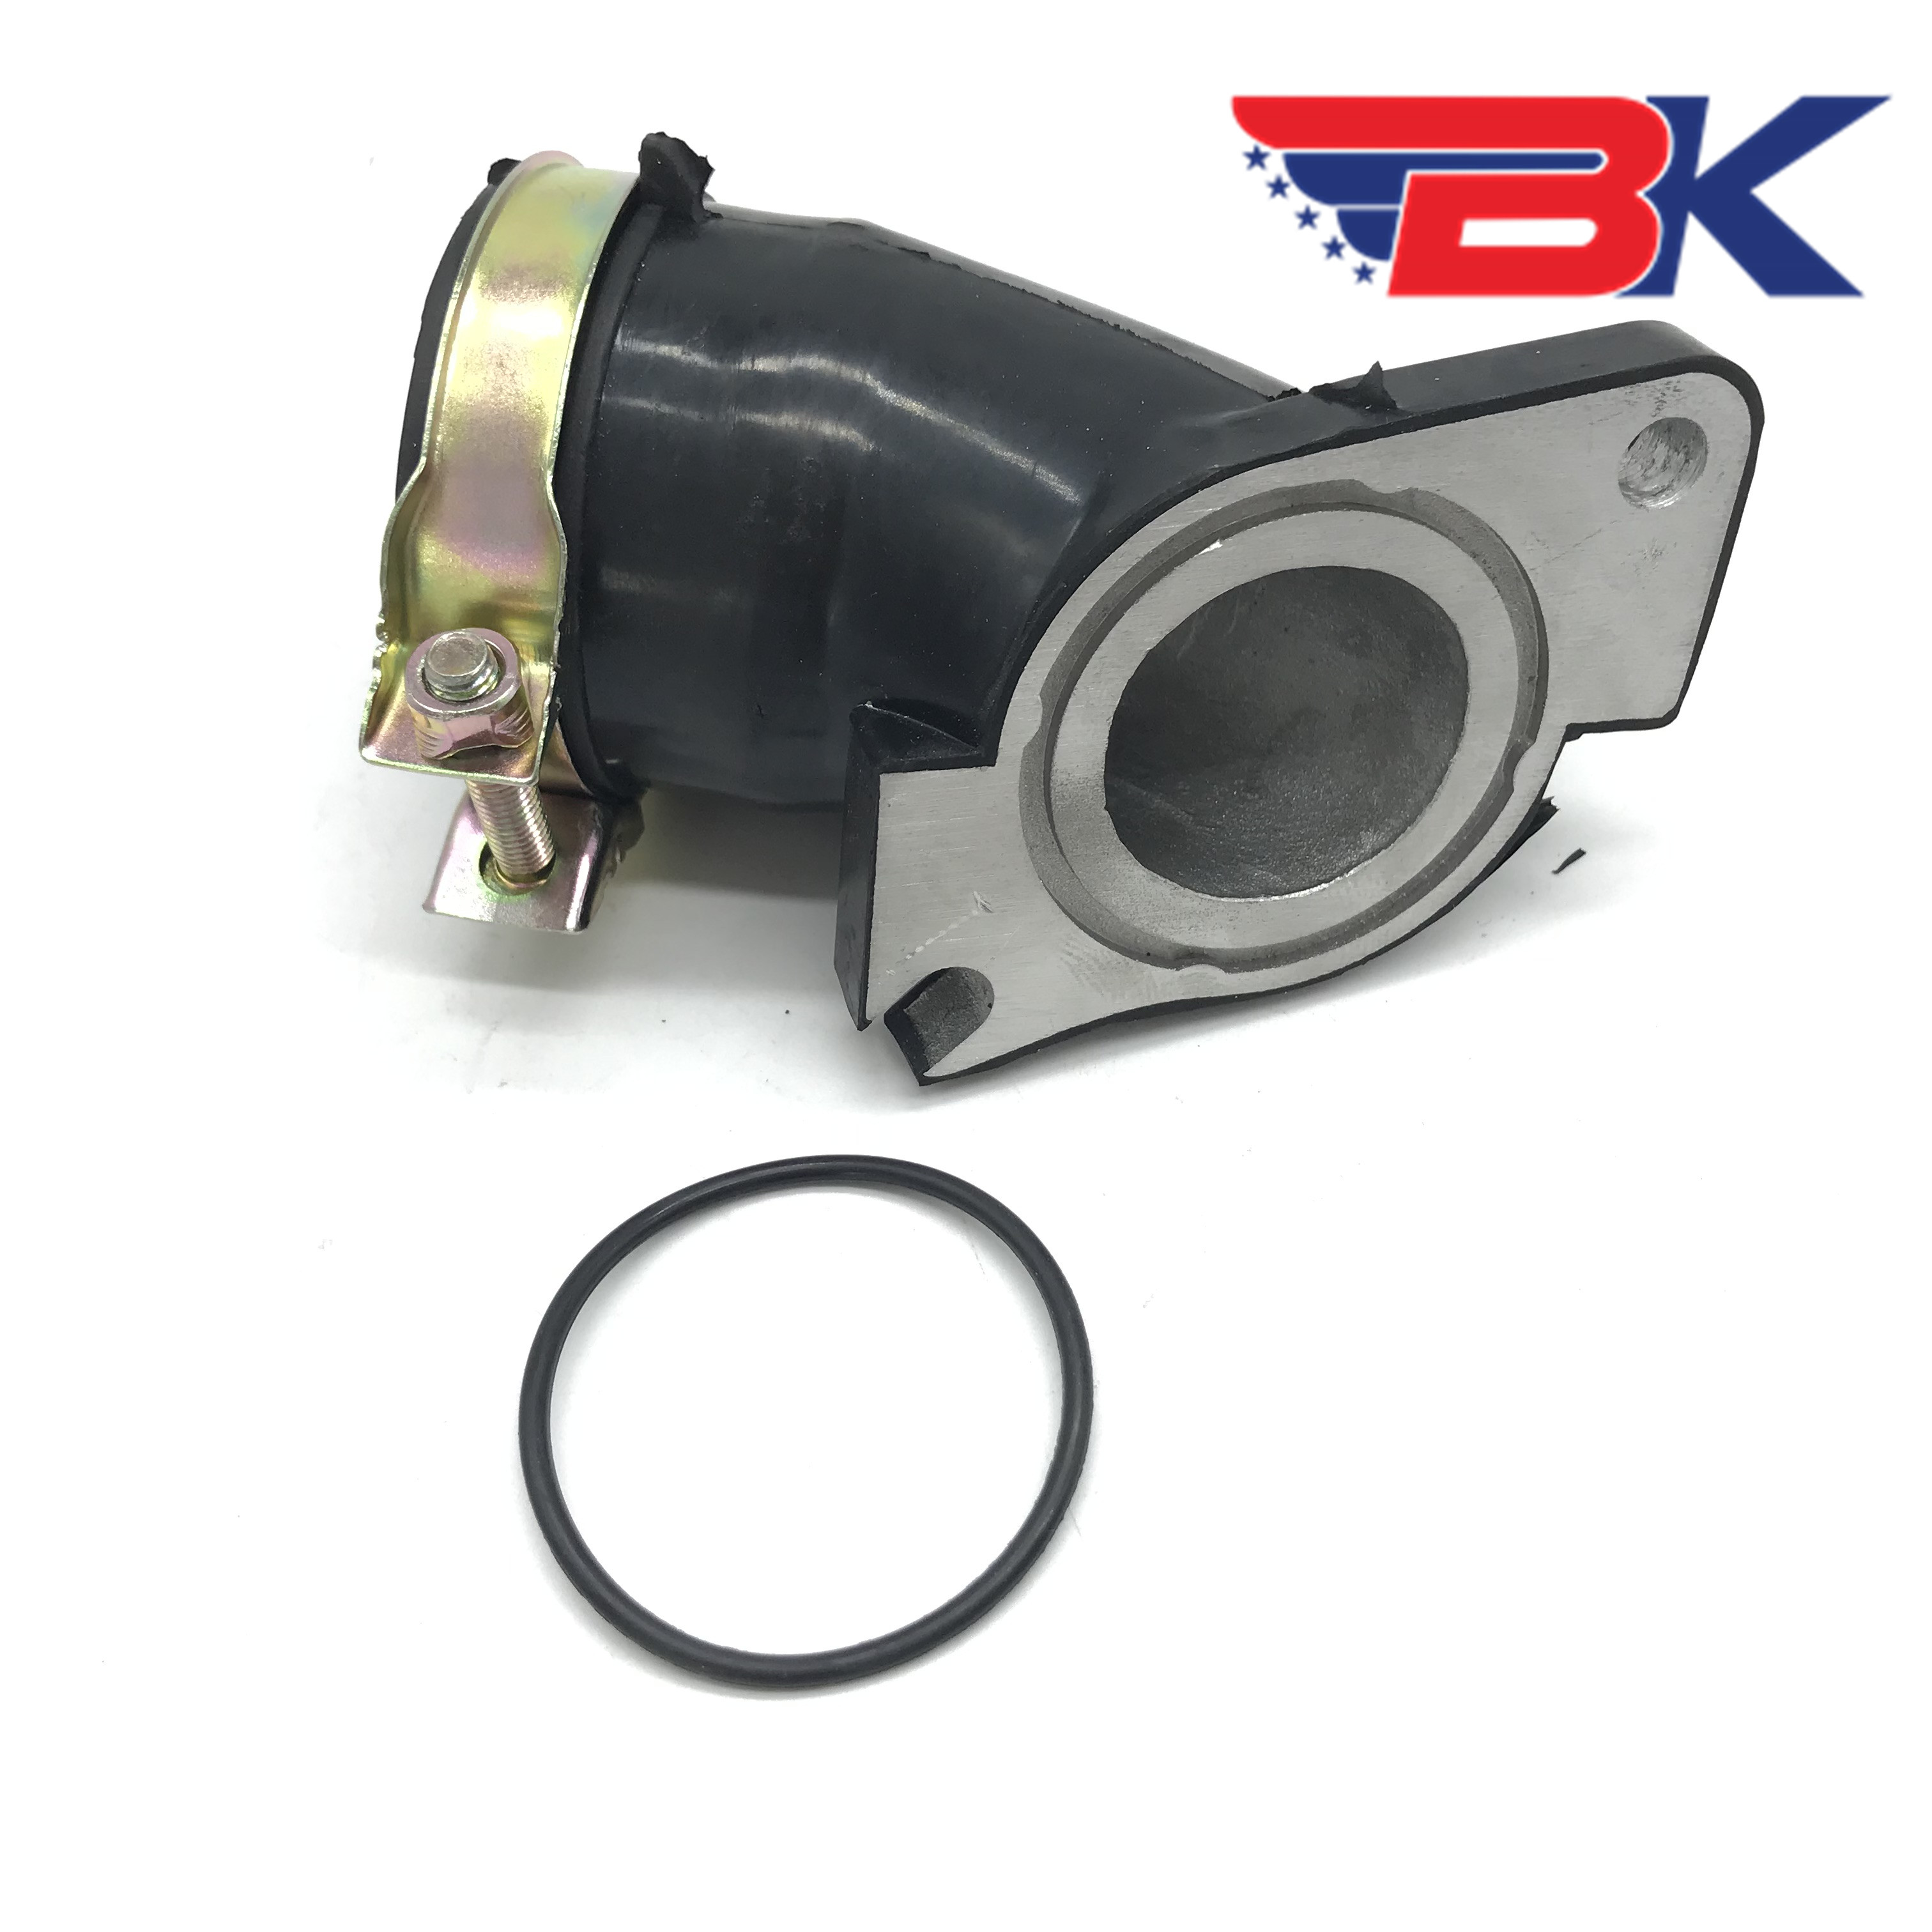 Carburetor Intake Manifold For Linhai BUYANG FEISHEN FA-D300 170MM 173MN 260CC 300CC YP250 VOG250 ATV Quad Scooter